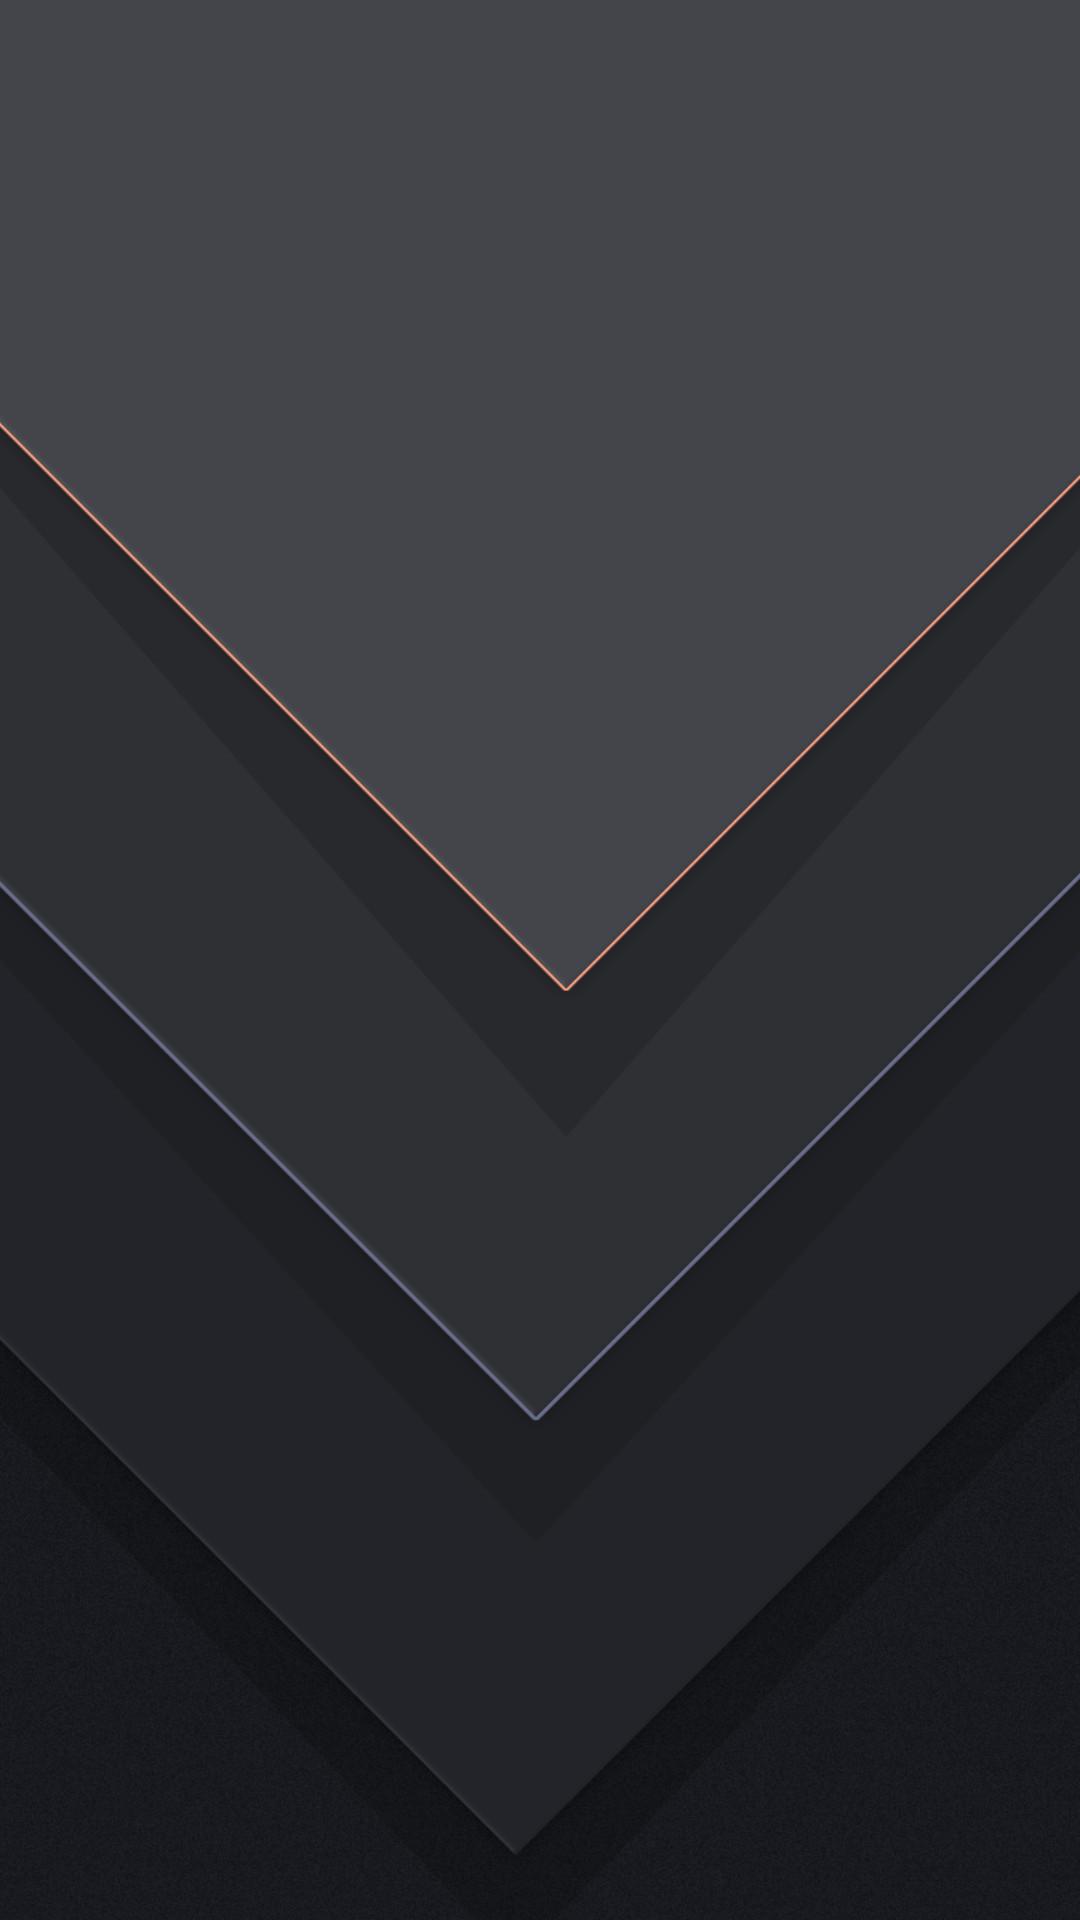 1080x1920 Dark Grey Material Andro Dark Wallpaper For Android Phone 1080x1920 Wallpaper Teahub Io